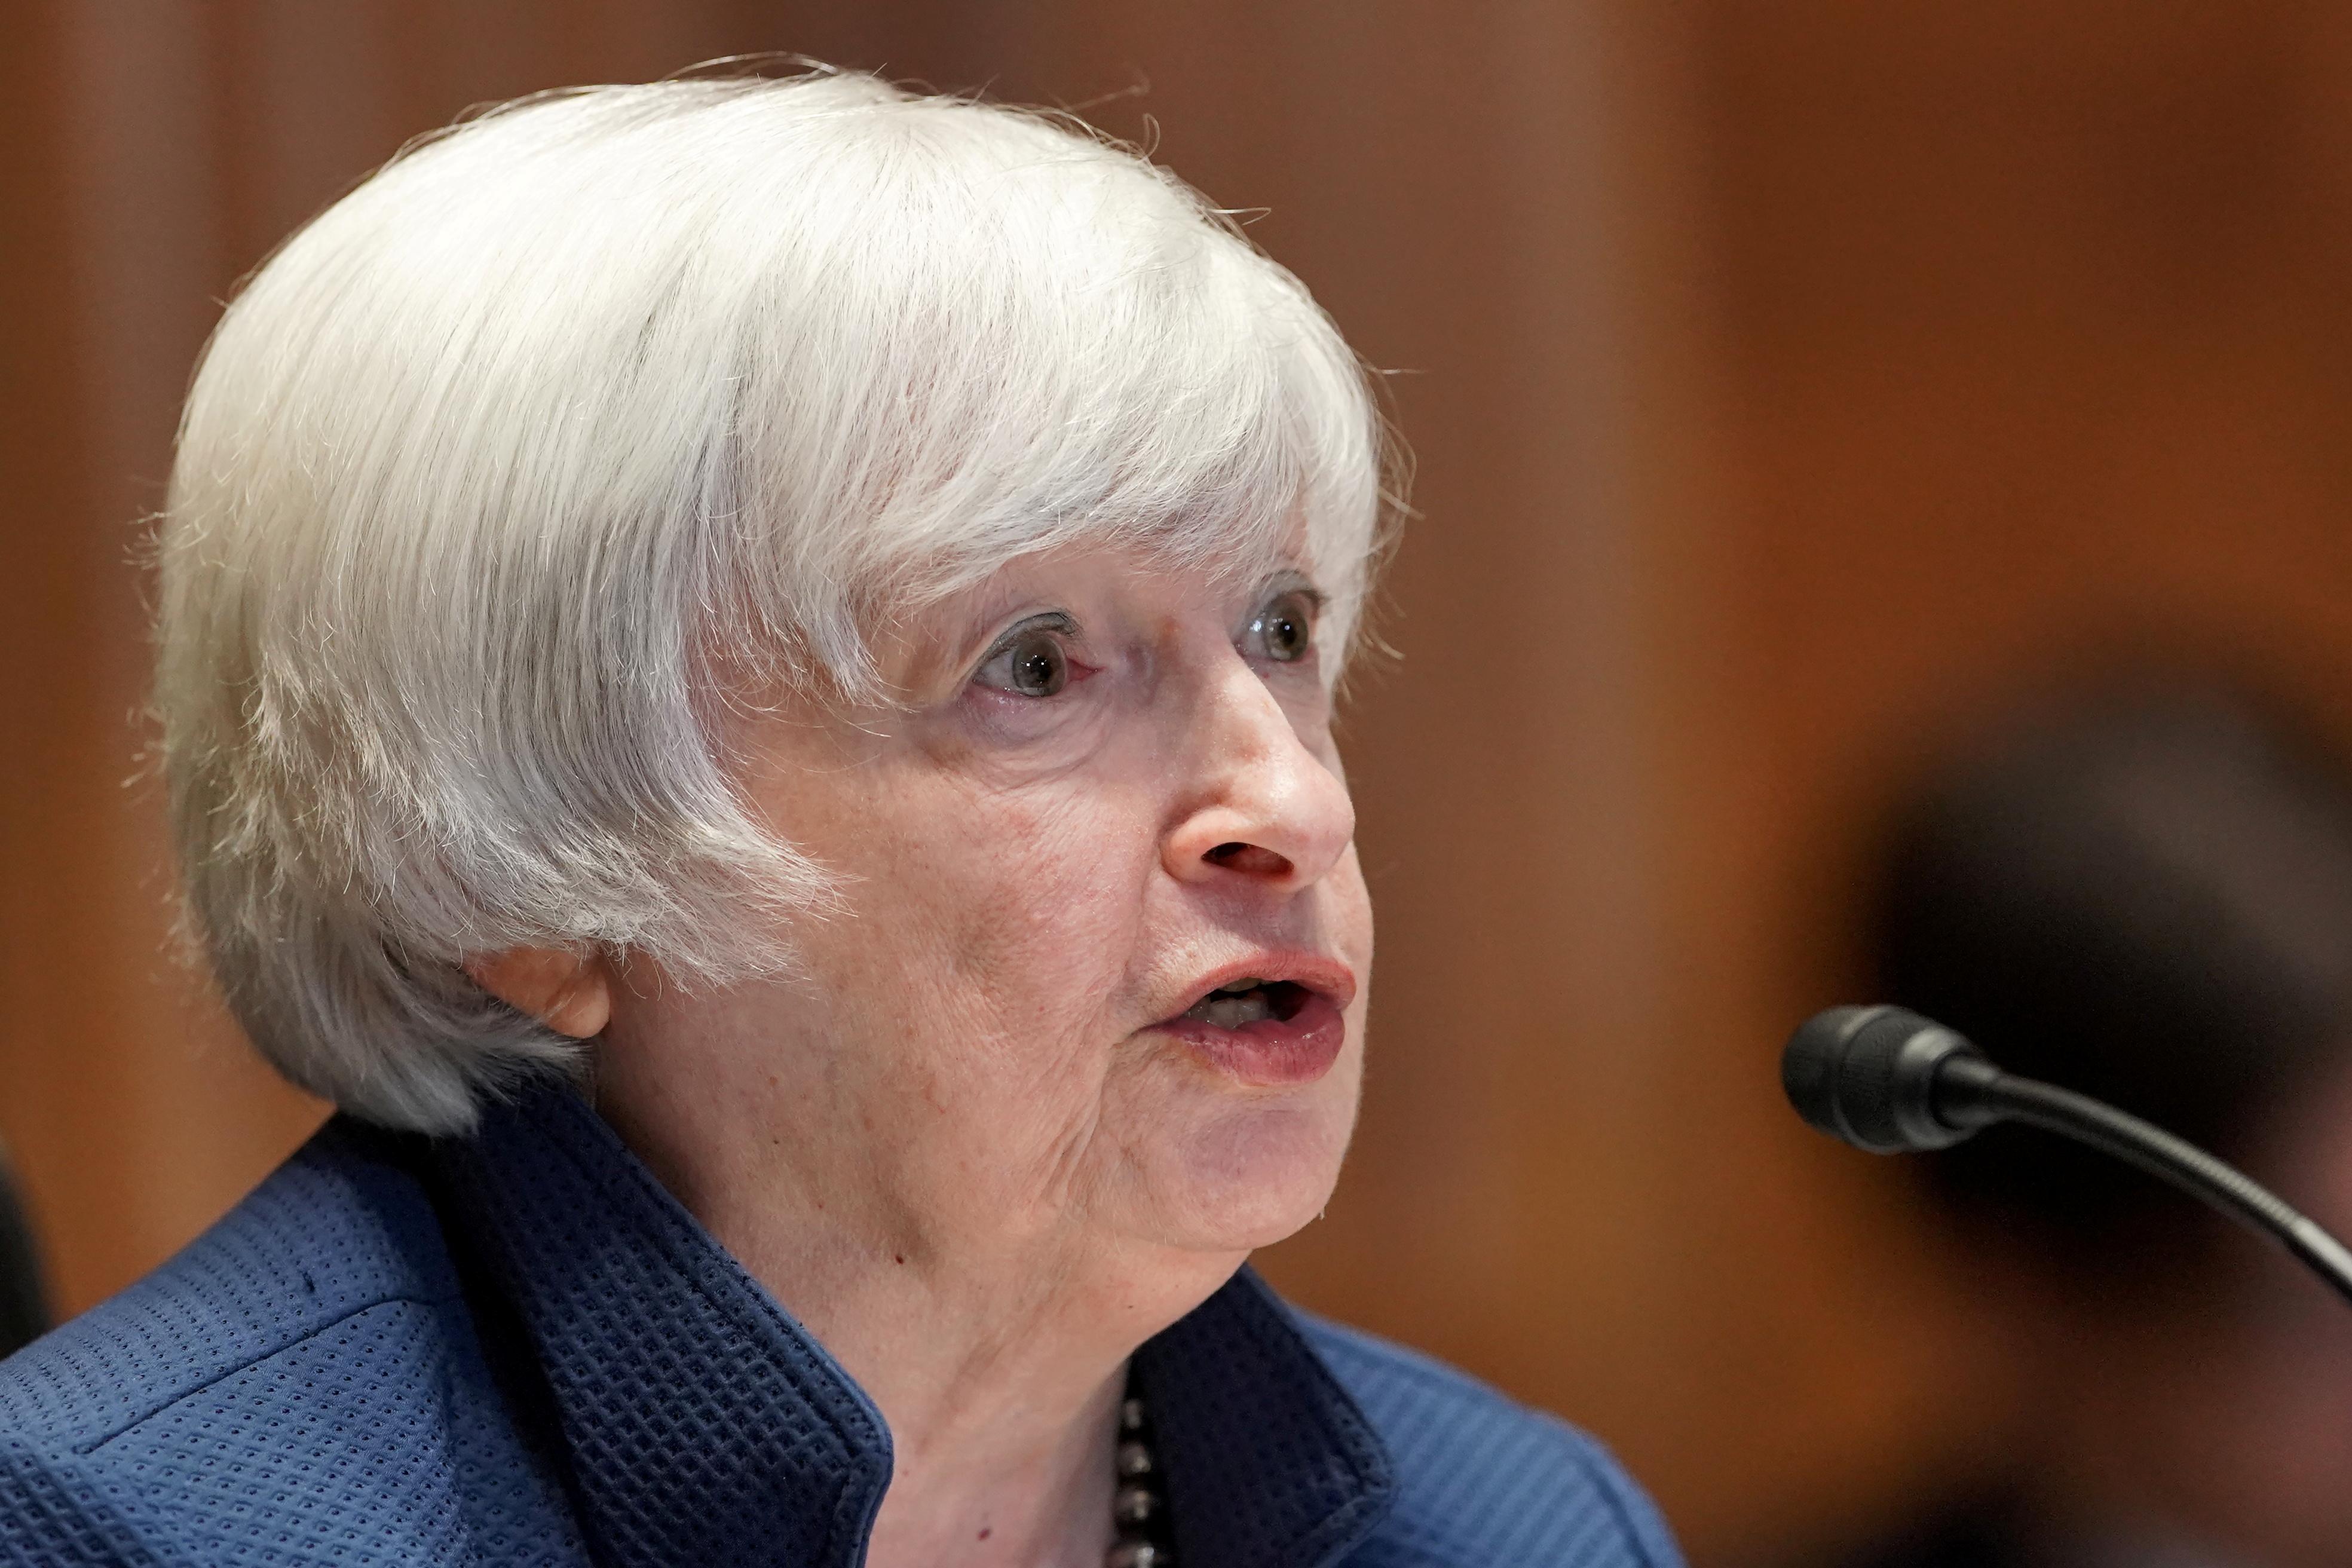 Yellen says without debt limit hike, U.S. could face August default risk